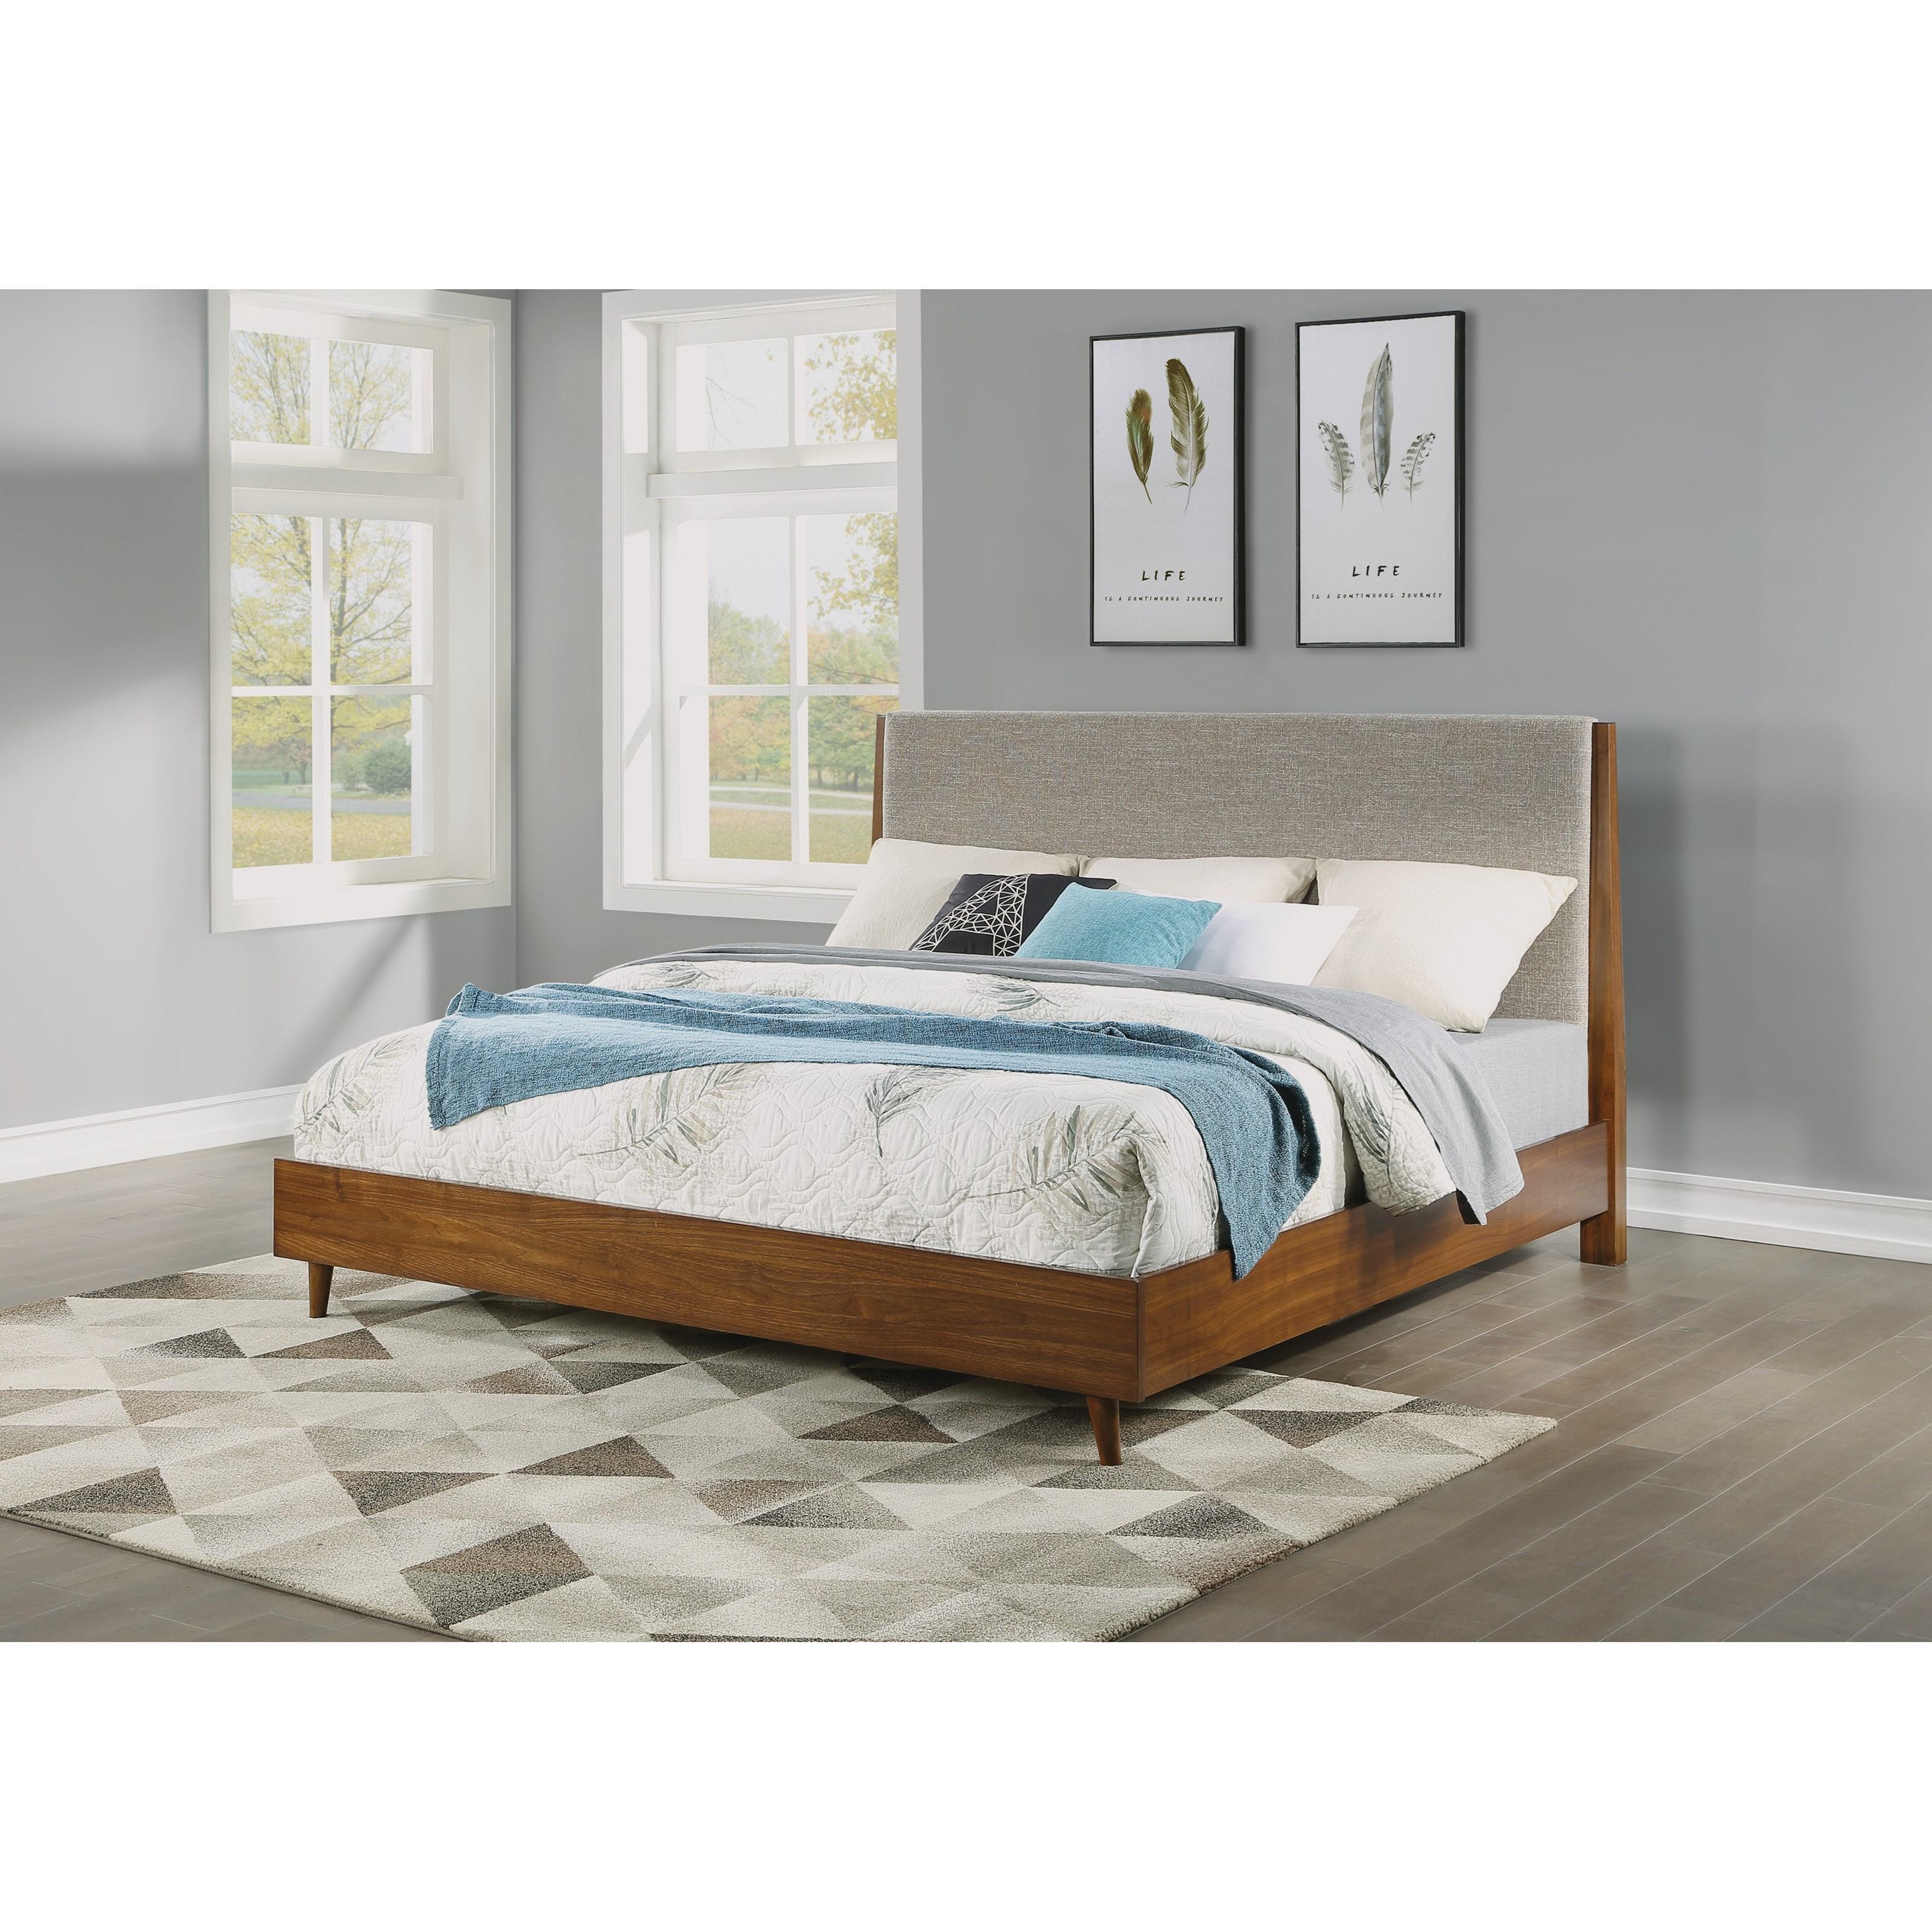 Flexsteel Wynwood Collection Carmen Mid Century Modern Queen Upholstered Bed With Platform Frame Morris Home Upholstered Beds